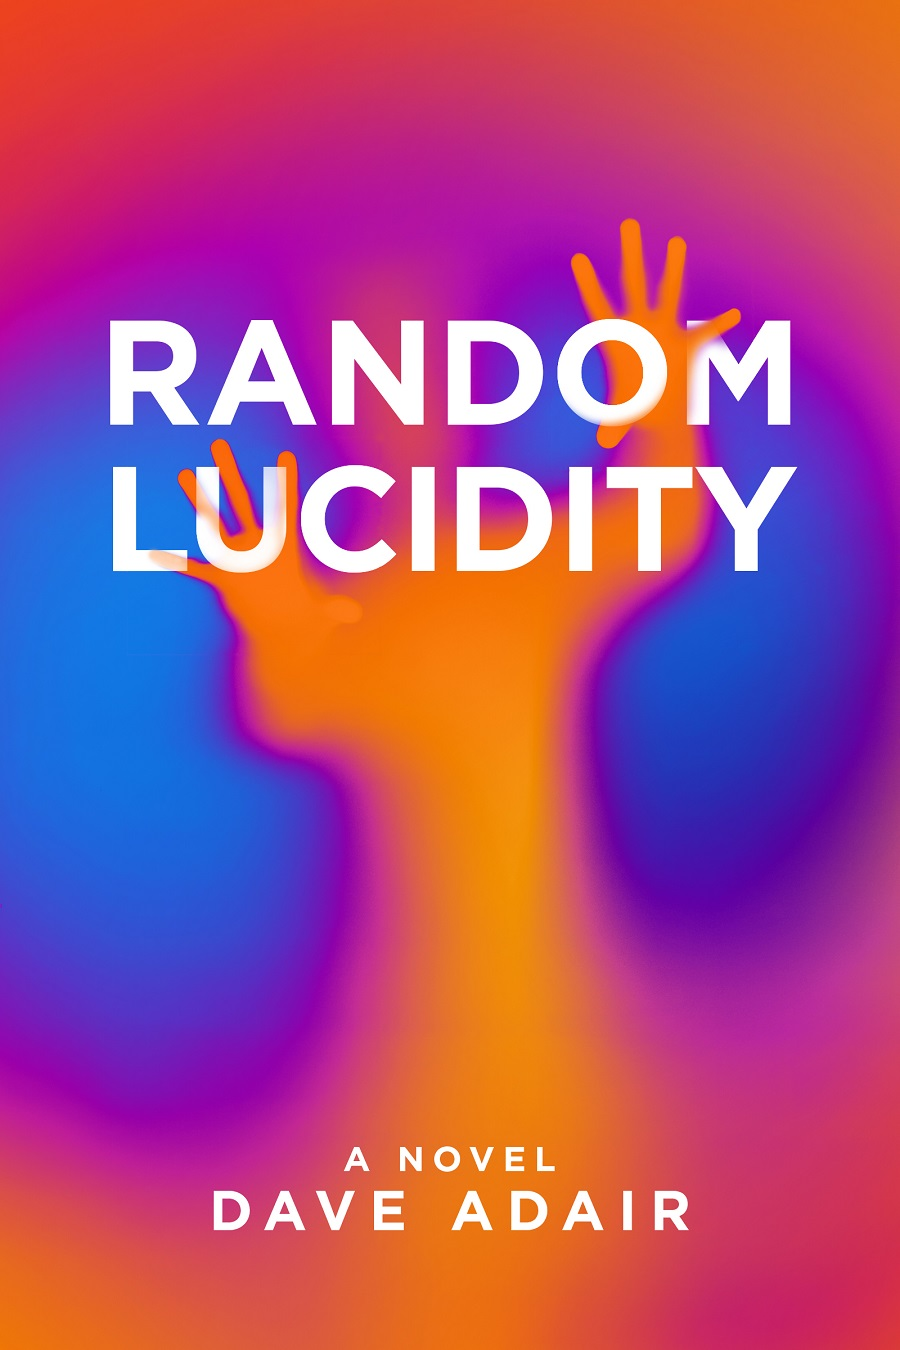 Random Lucidity by Dave Adair